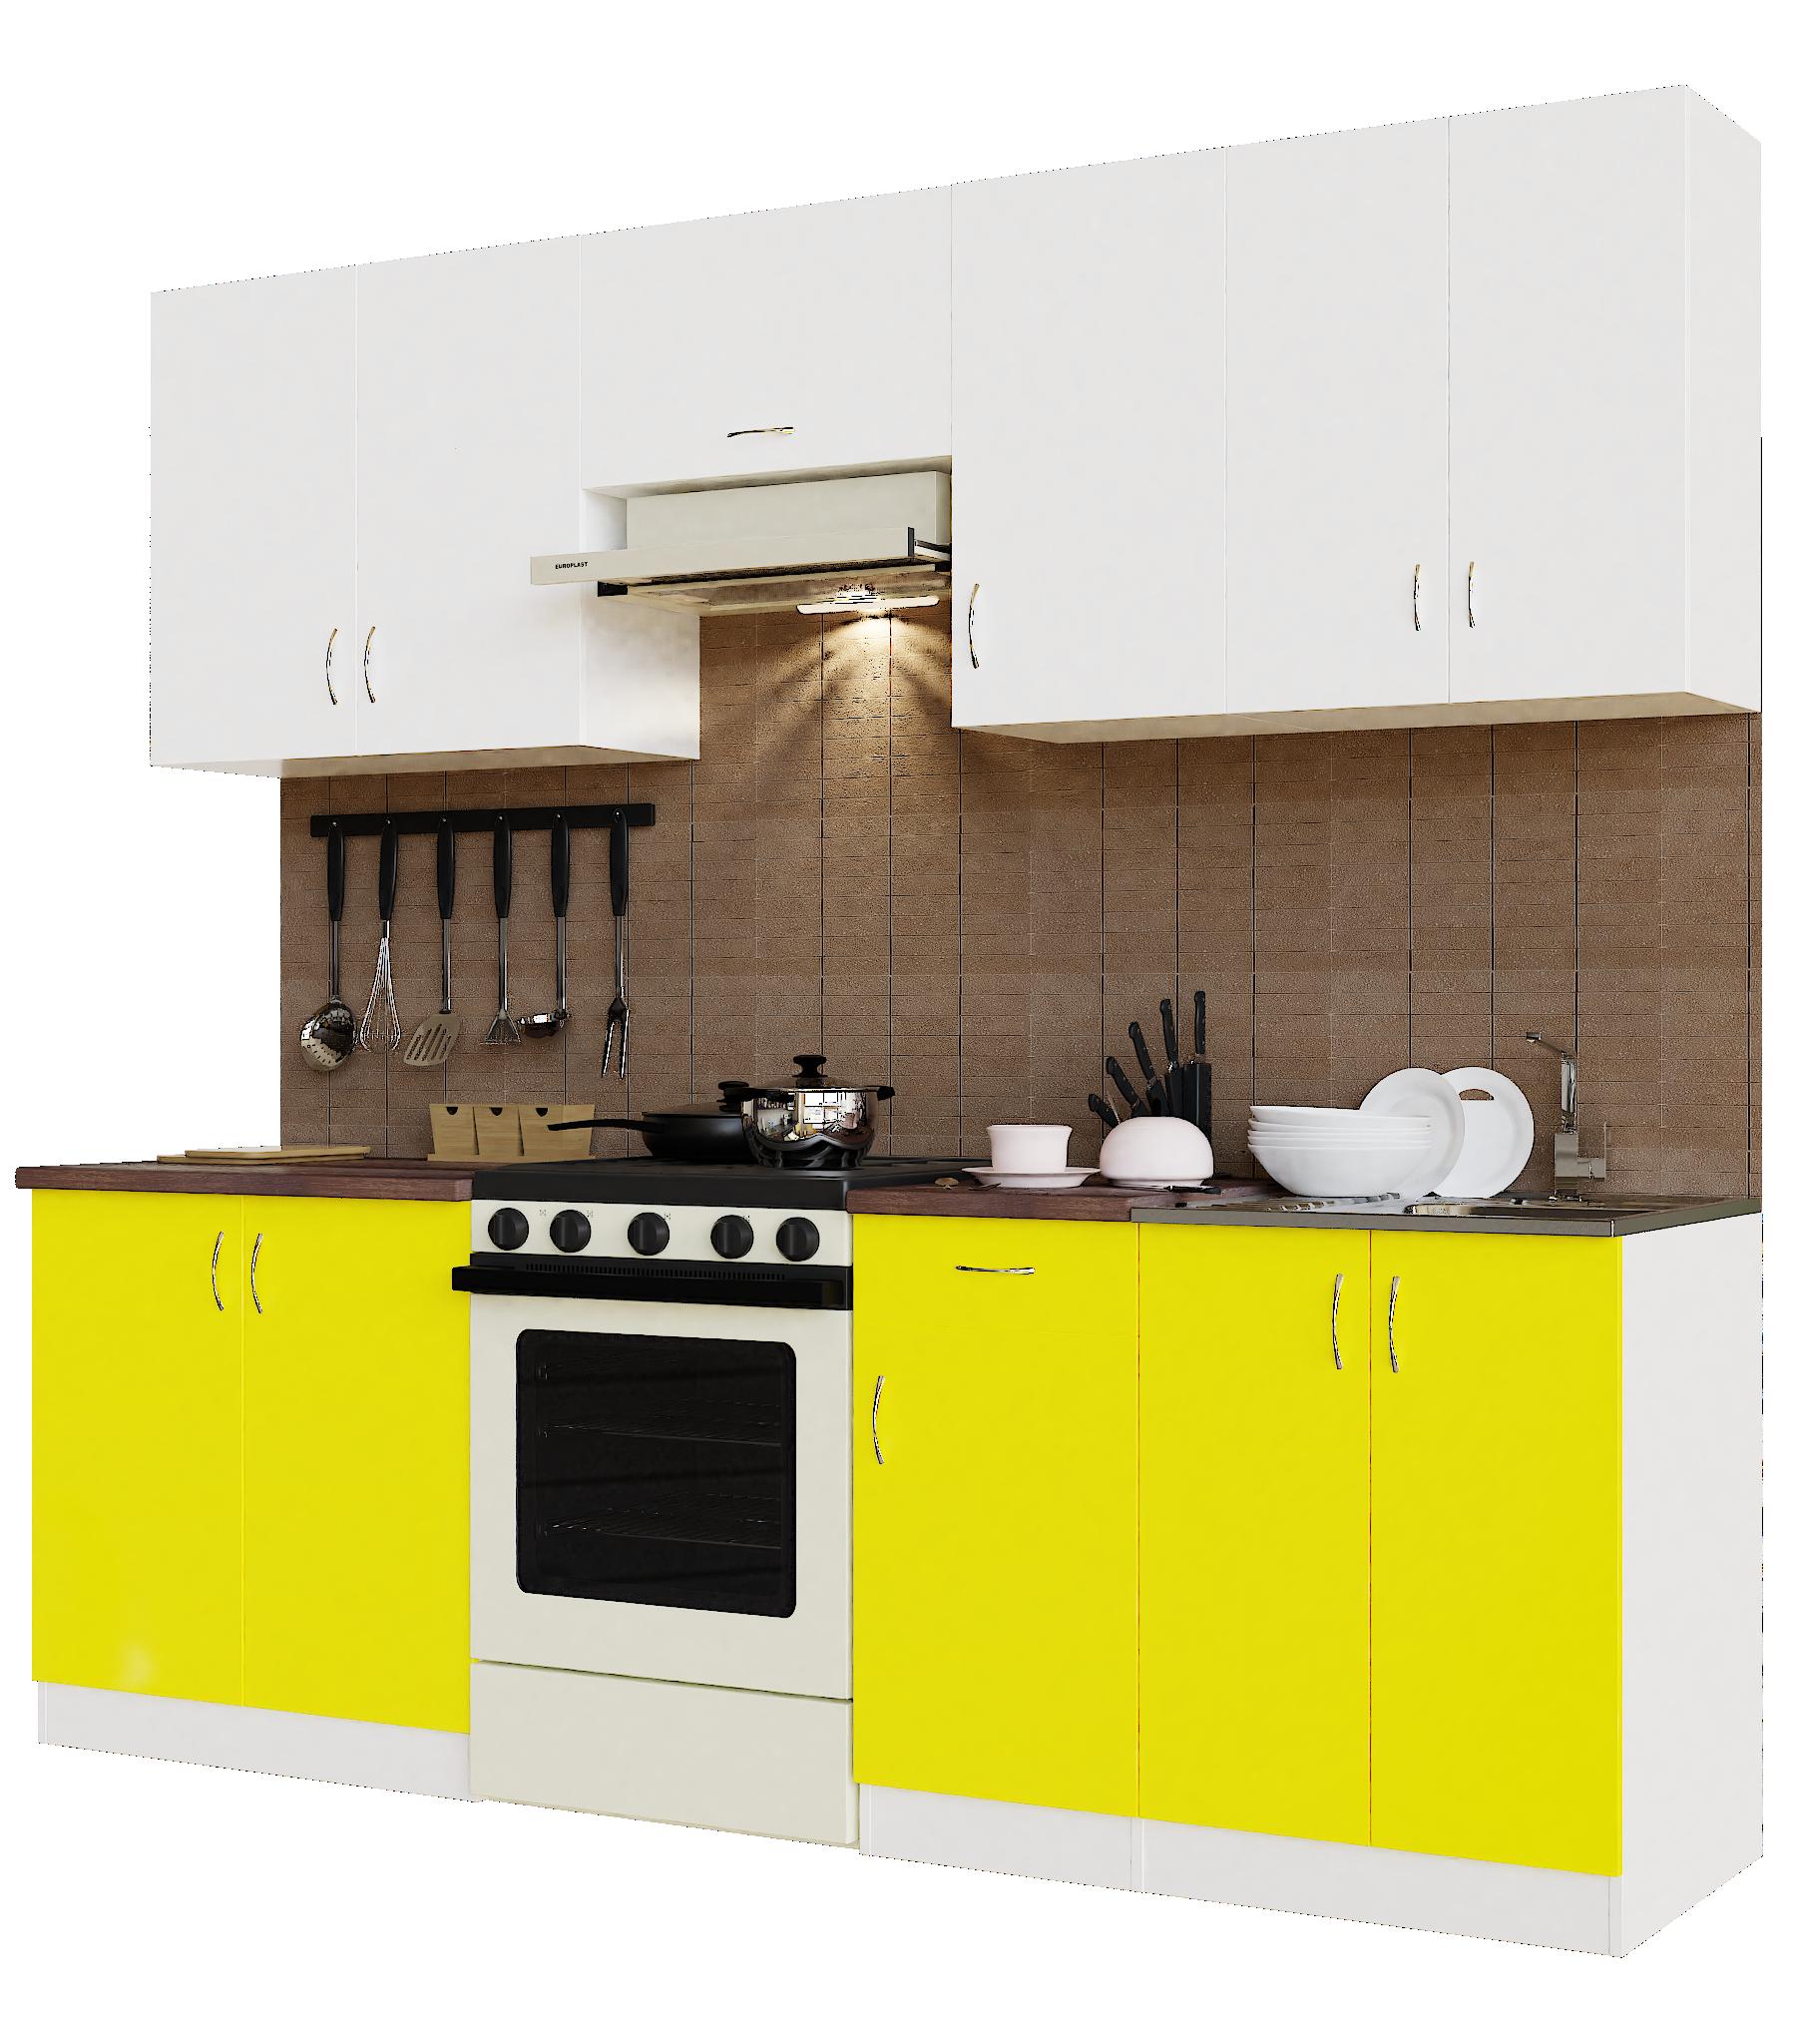 Кухонный гарнитур Sanvut ГК2400 - 5.5_10.1 Белый / Желтый / Венге